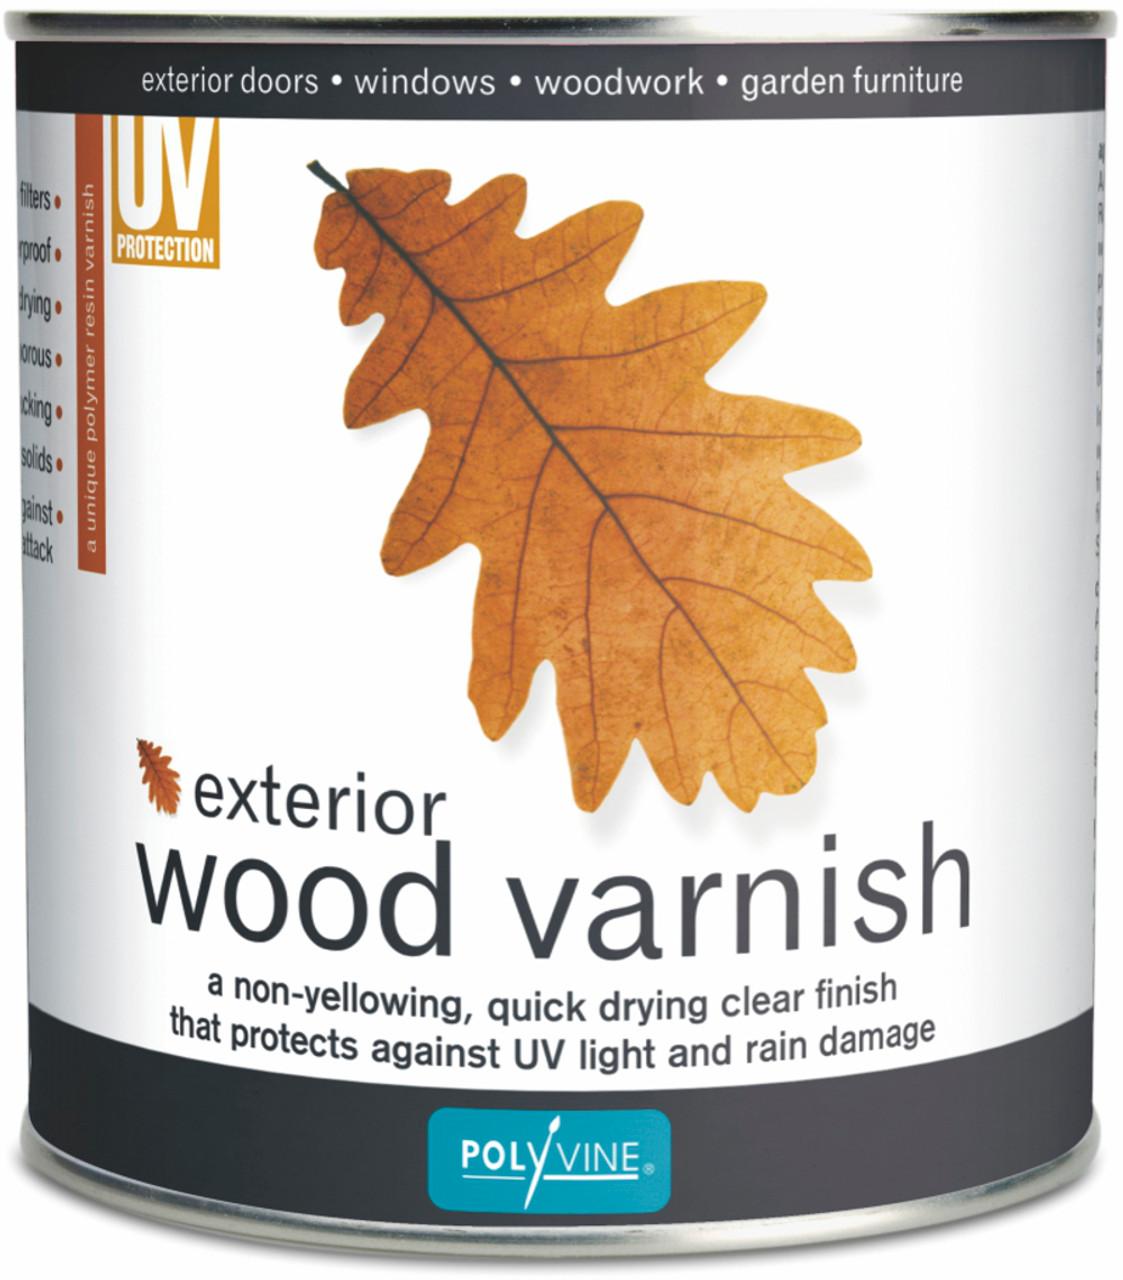 Polyvine Exterior Wood Varnish Clear Dead Flat